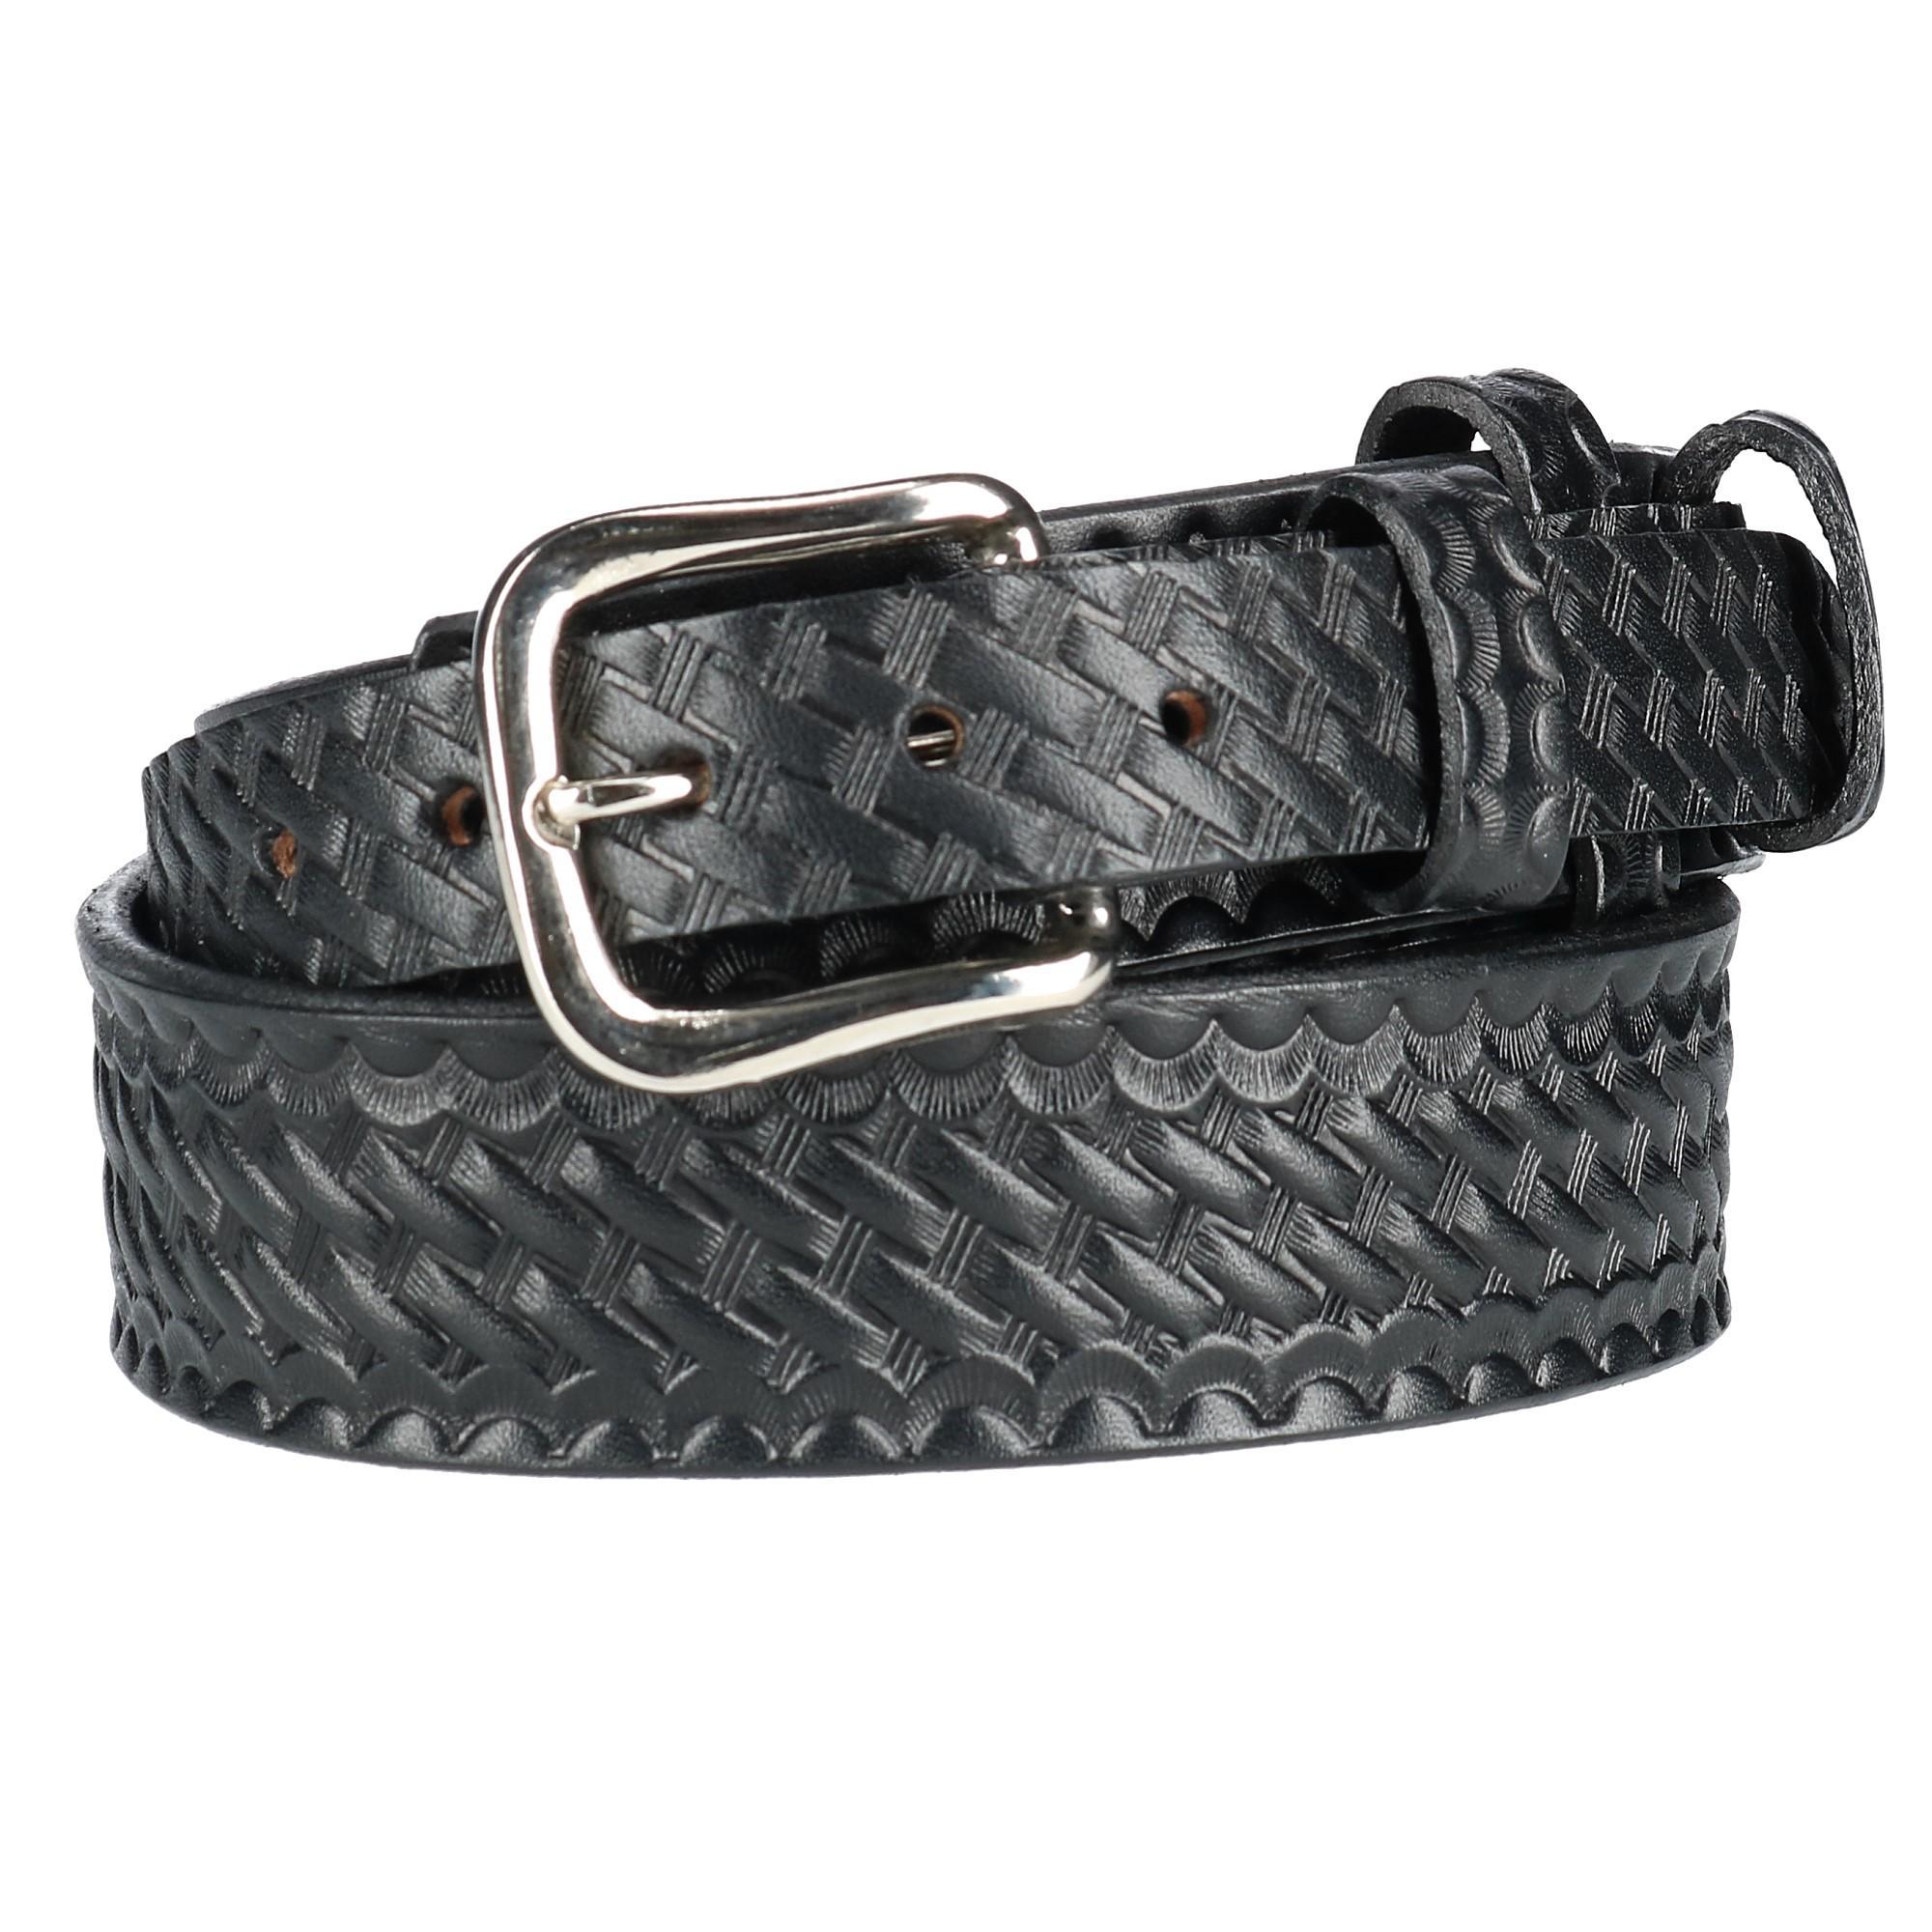 Boston Leather Men's Big & Tall Leather Basketweave Ranger Belt